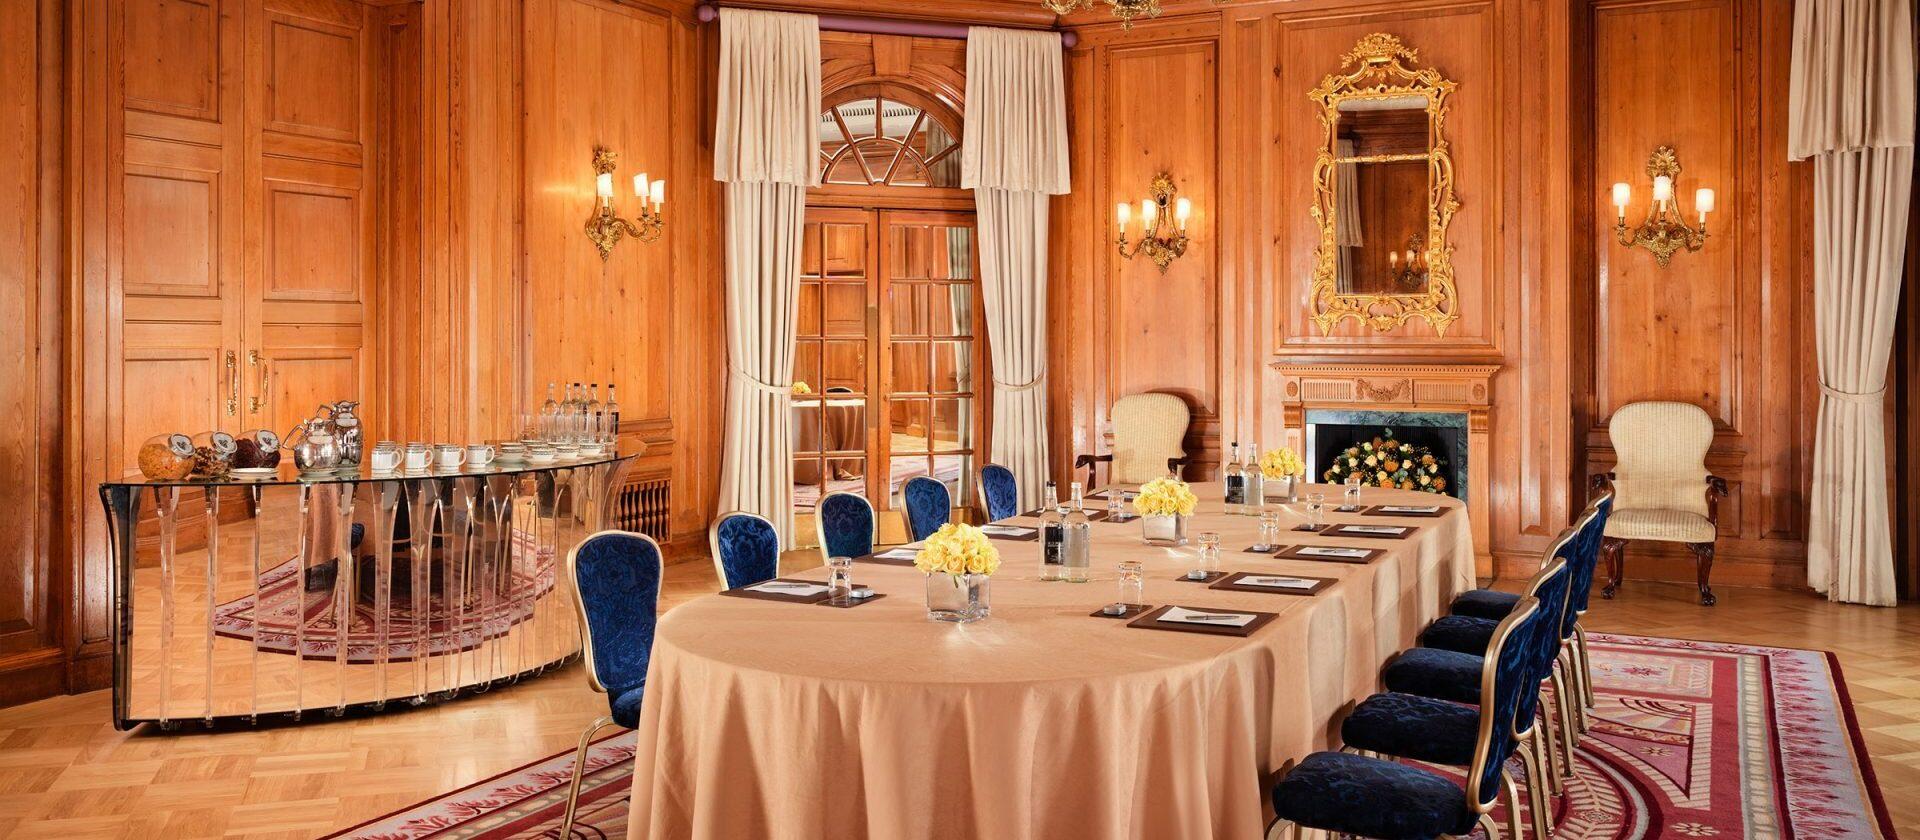 Dorchester Hotel Holford Room